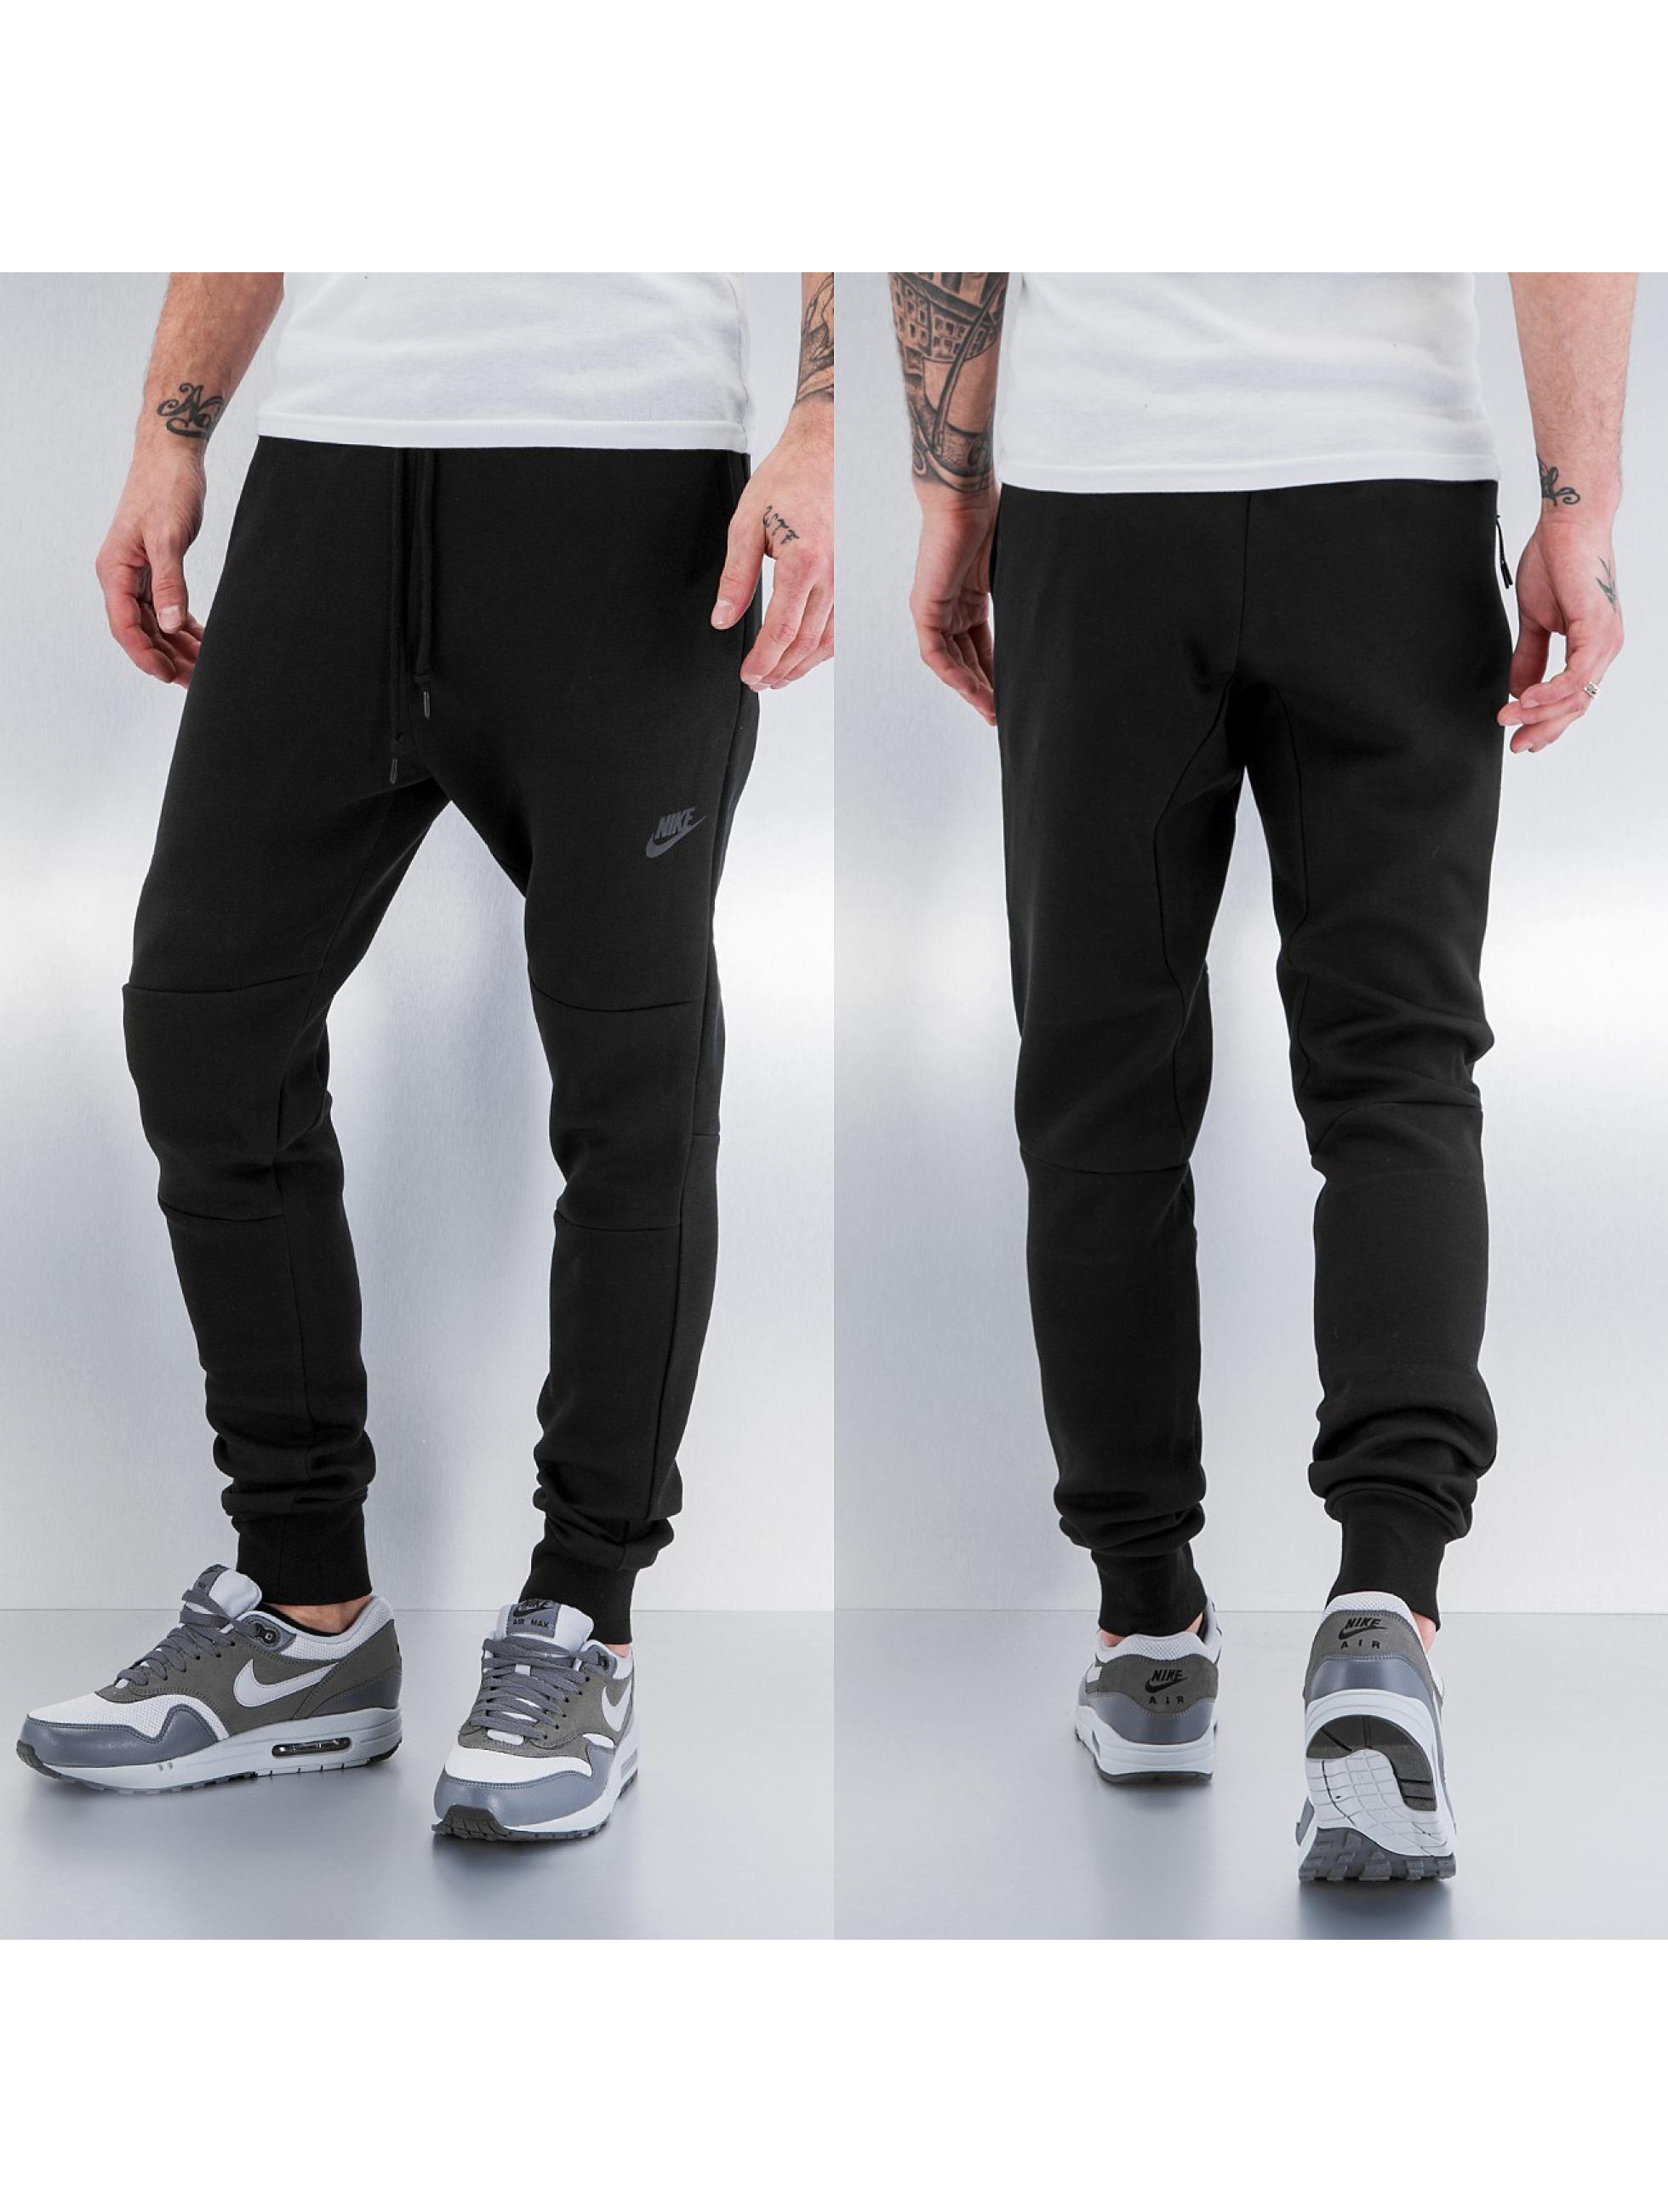 nike hose jogginghose tech fleece in schwarz 147185. Black Bedroom Furniture Sets. Home Design Ideas